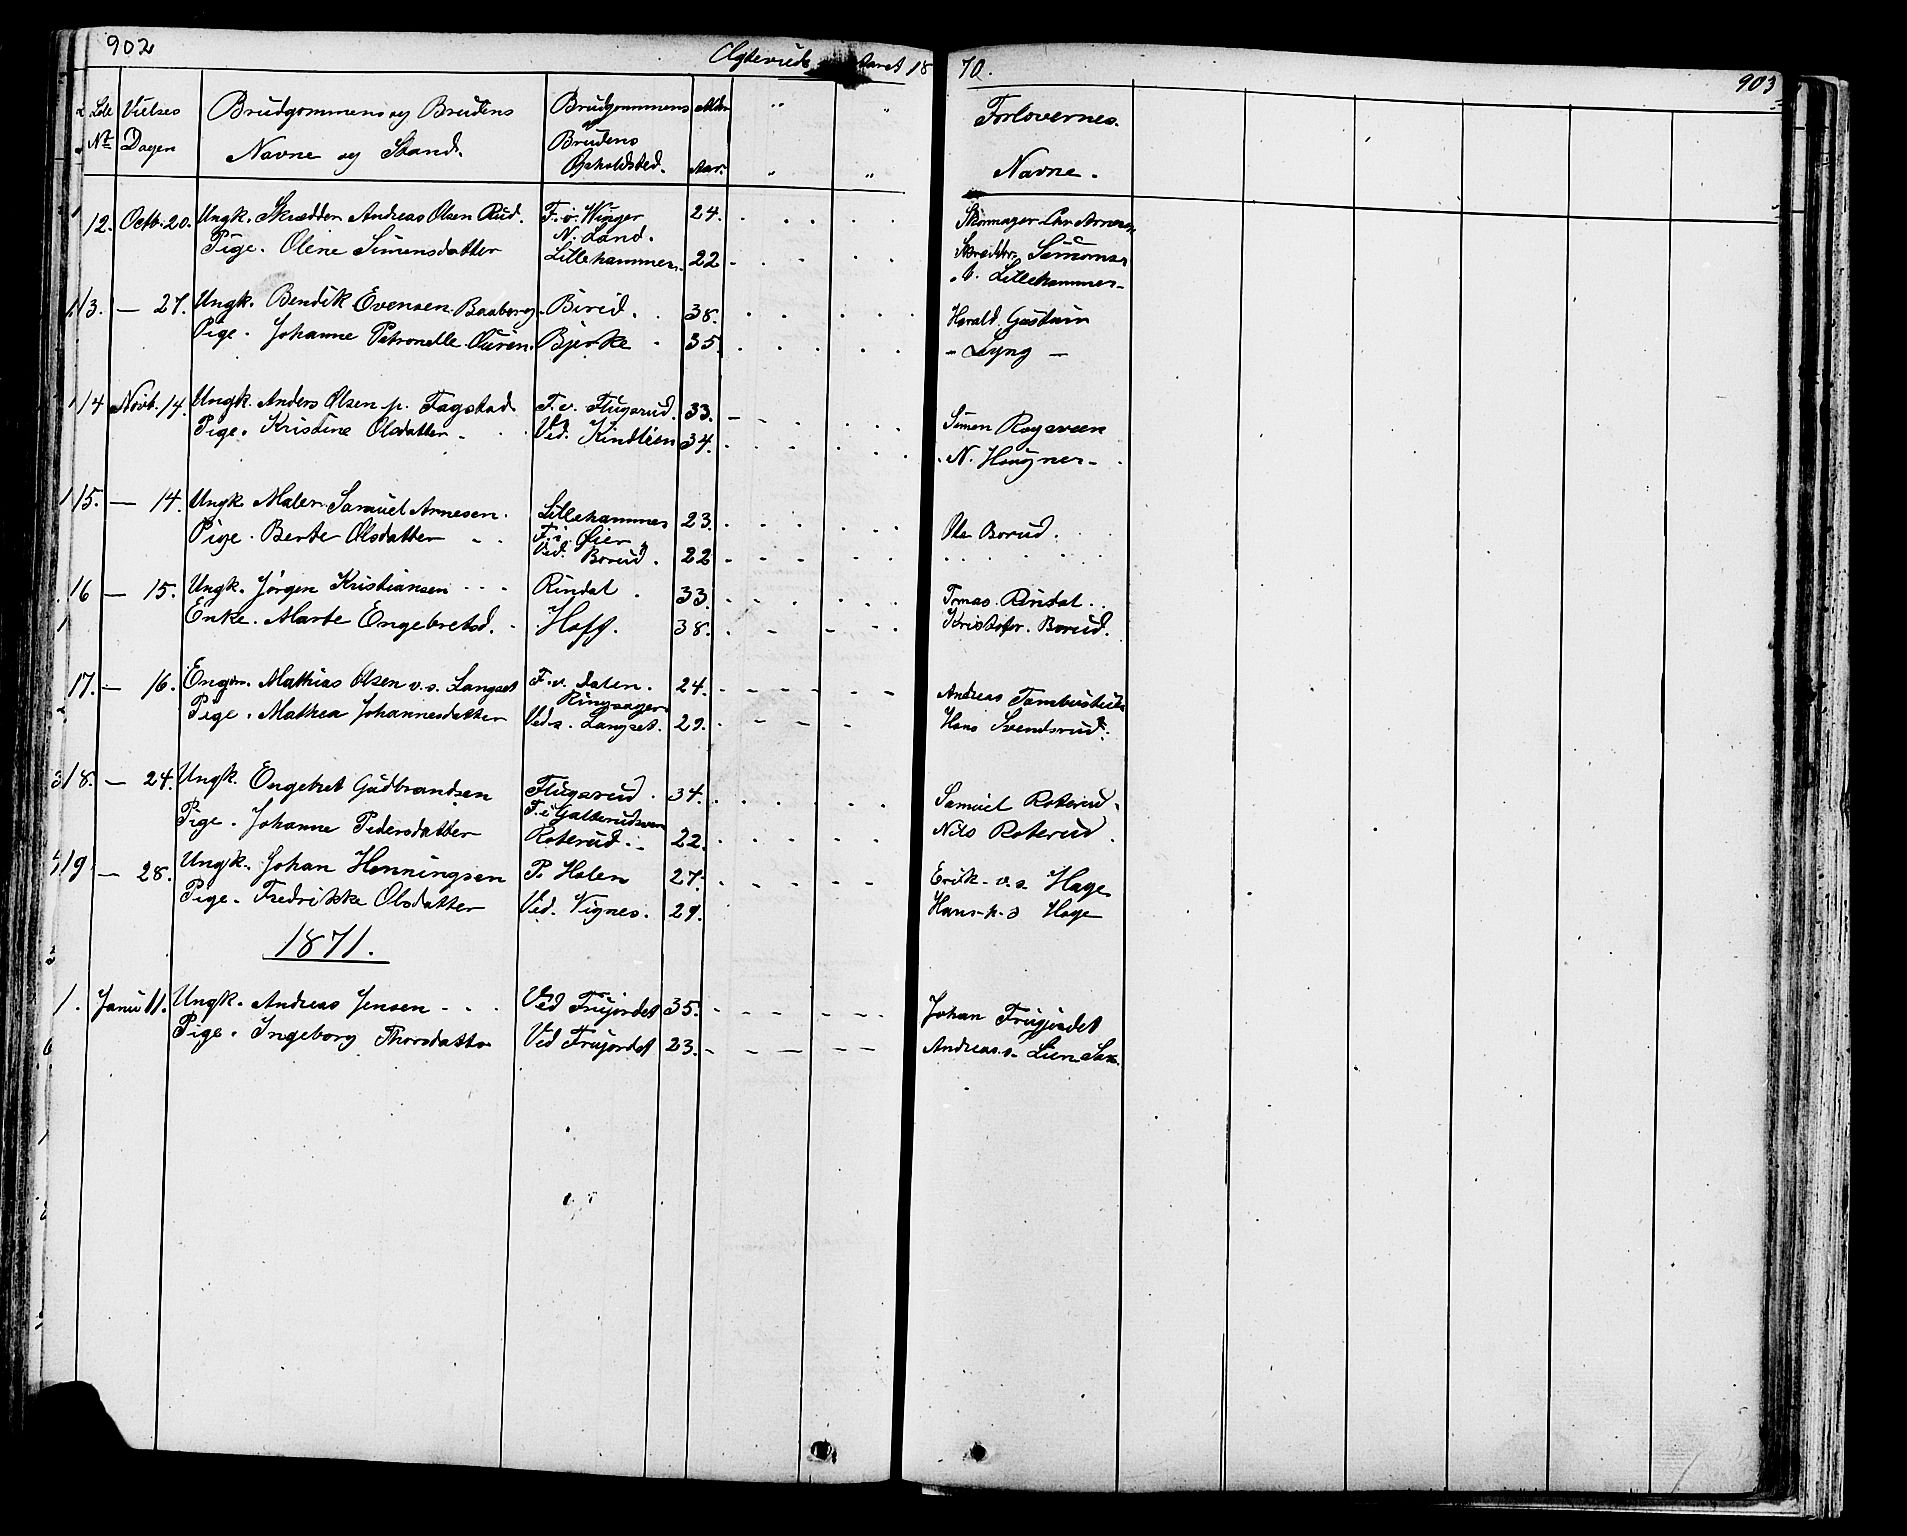 SAH, Fåberg prestekontor, Klokkerbok nr. 7, 1856-1891, s. 902-903